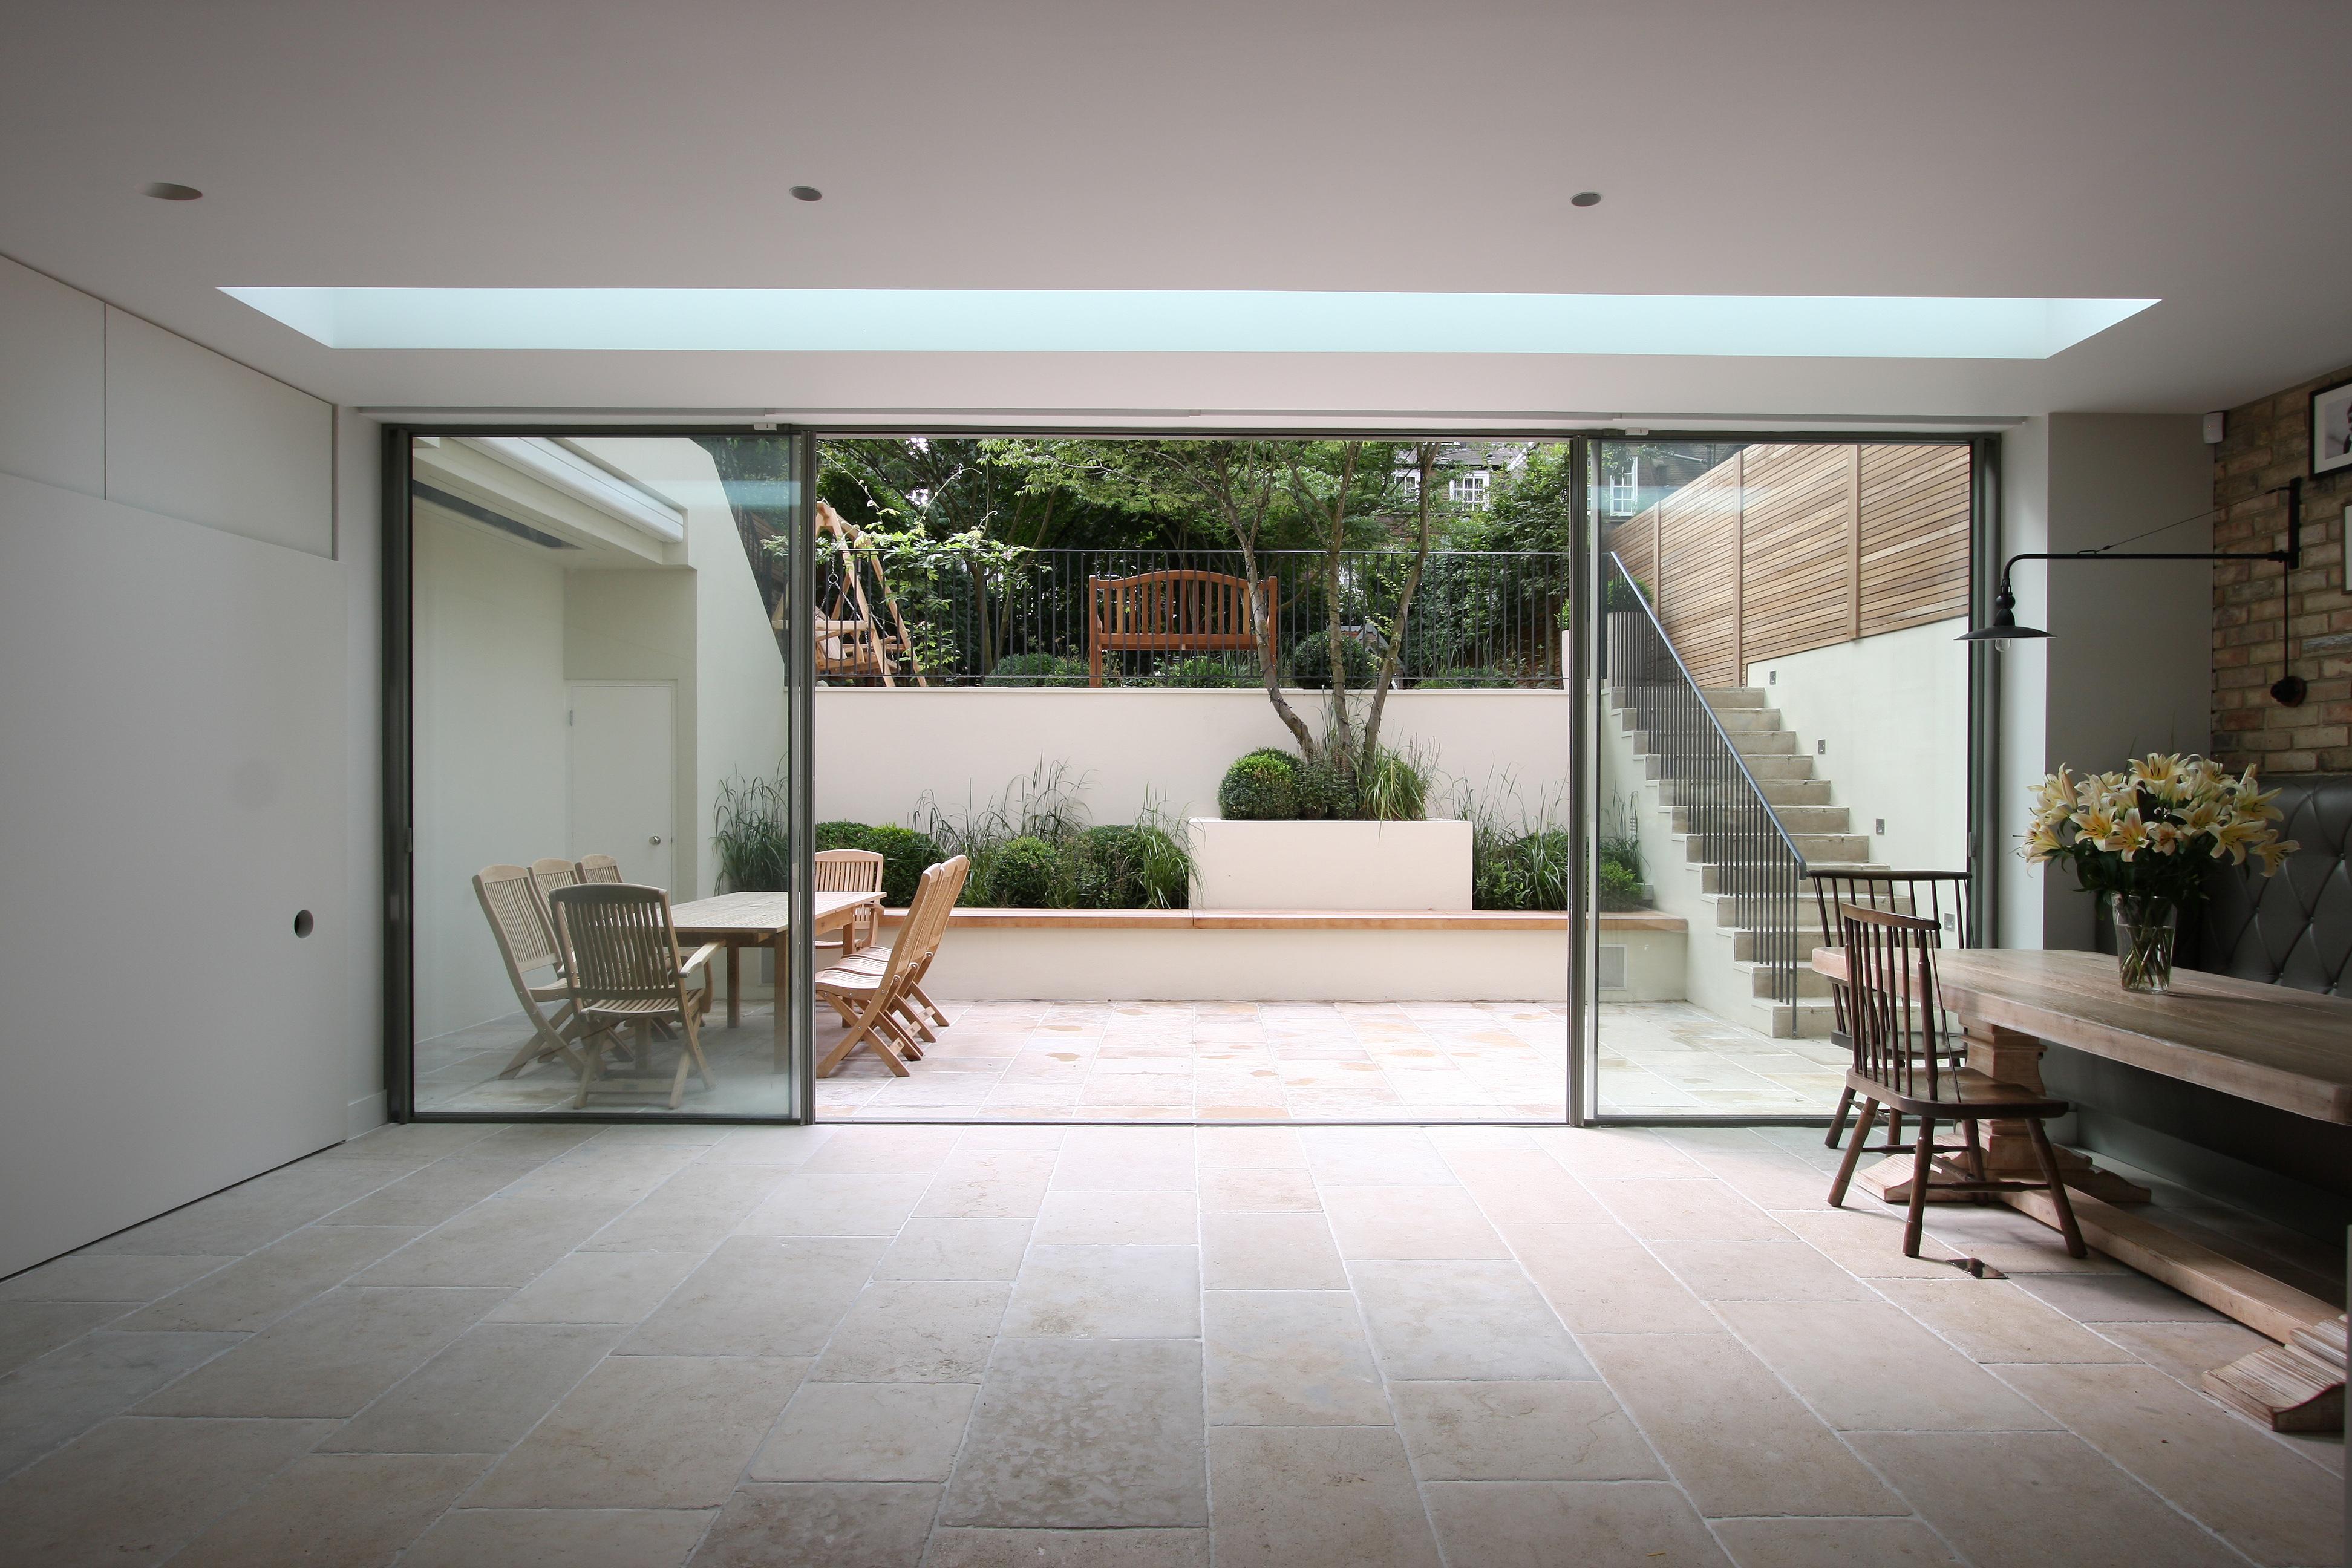 Ground Floor Window : House extensions archives minimal windows sliding glass